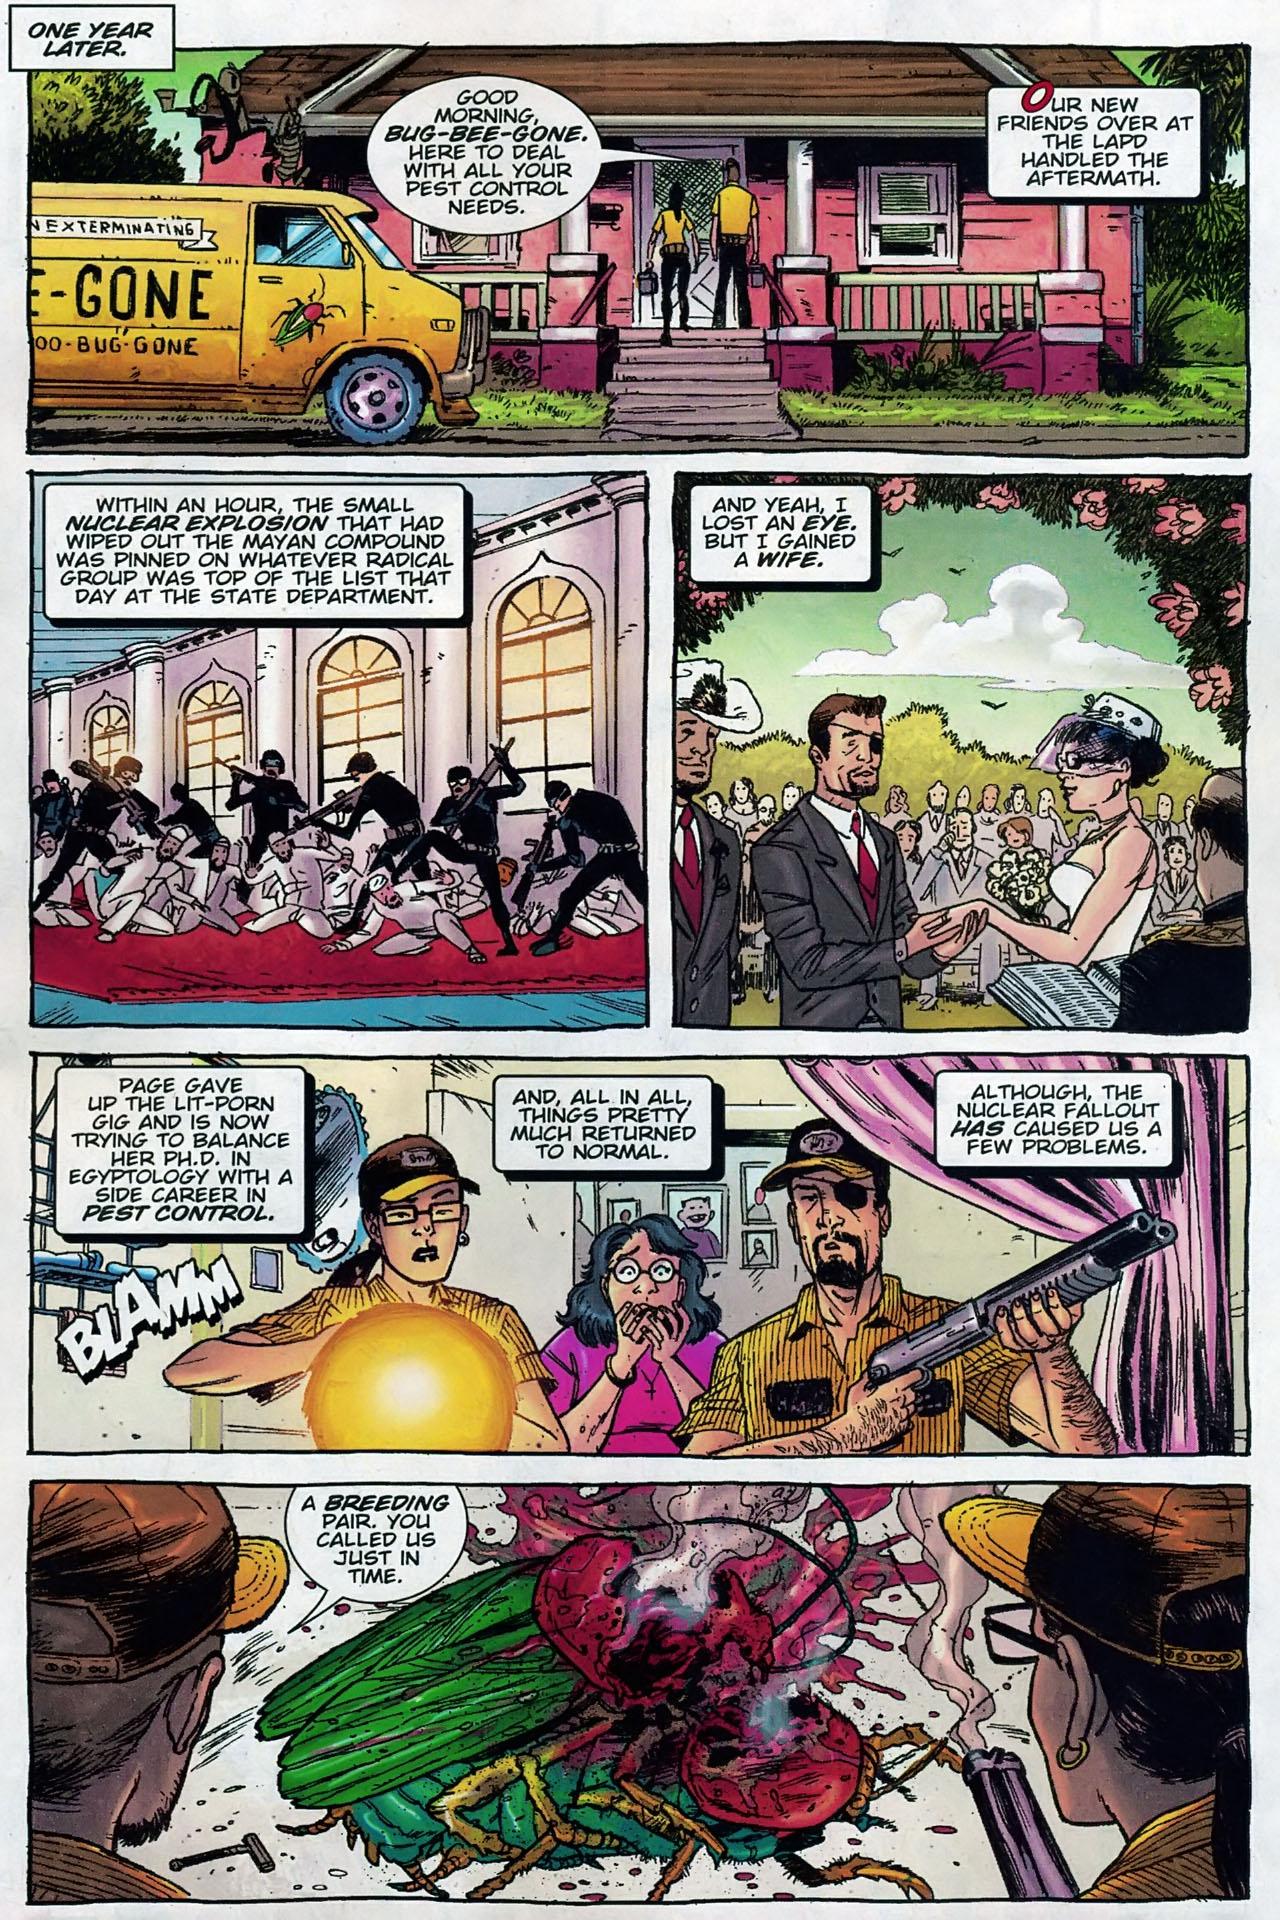 Read online The Exterminators comic -  Issue #30 - 23